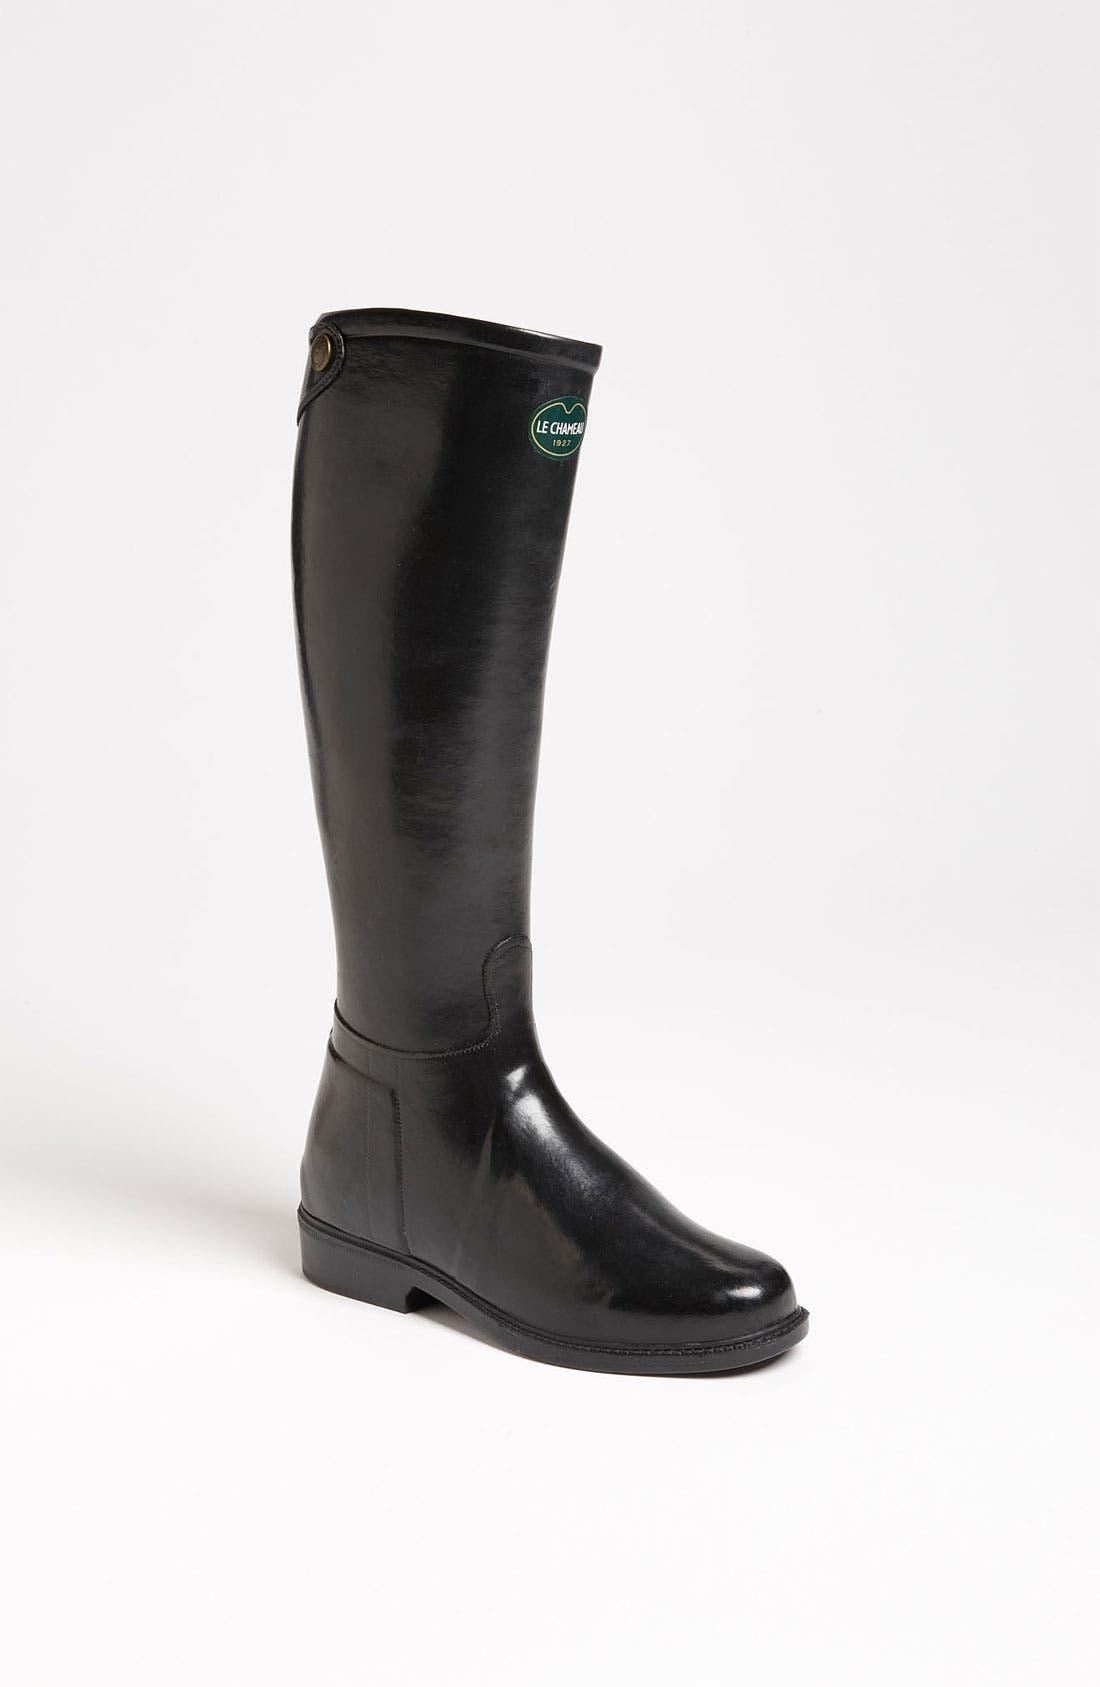 Alternate Image 1 Selected - Le Chameau 'Cavaliere' Rain Boot (Women)